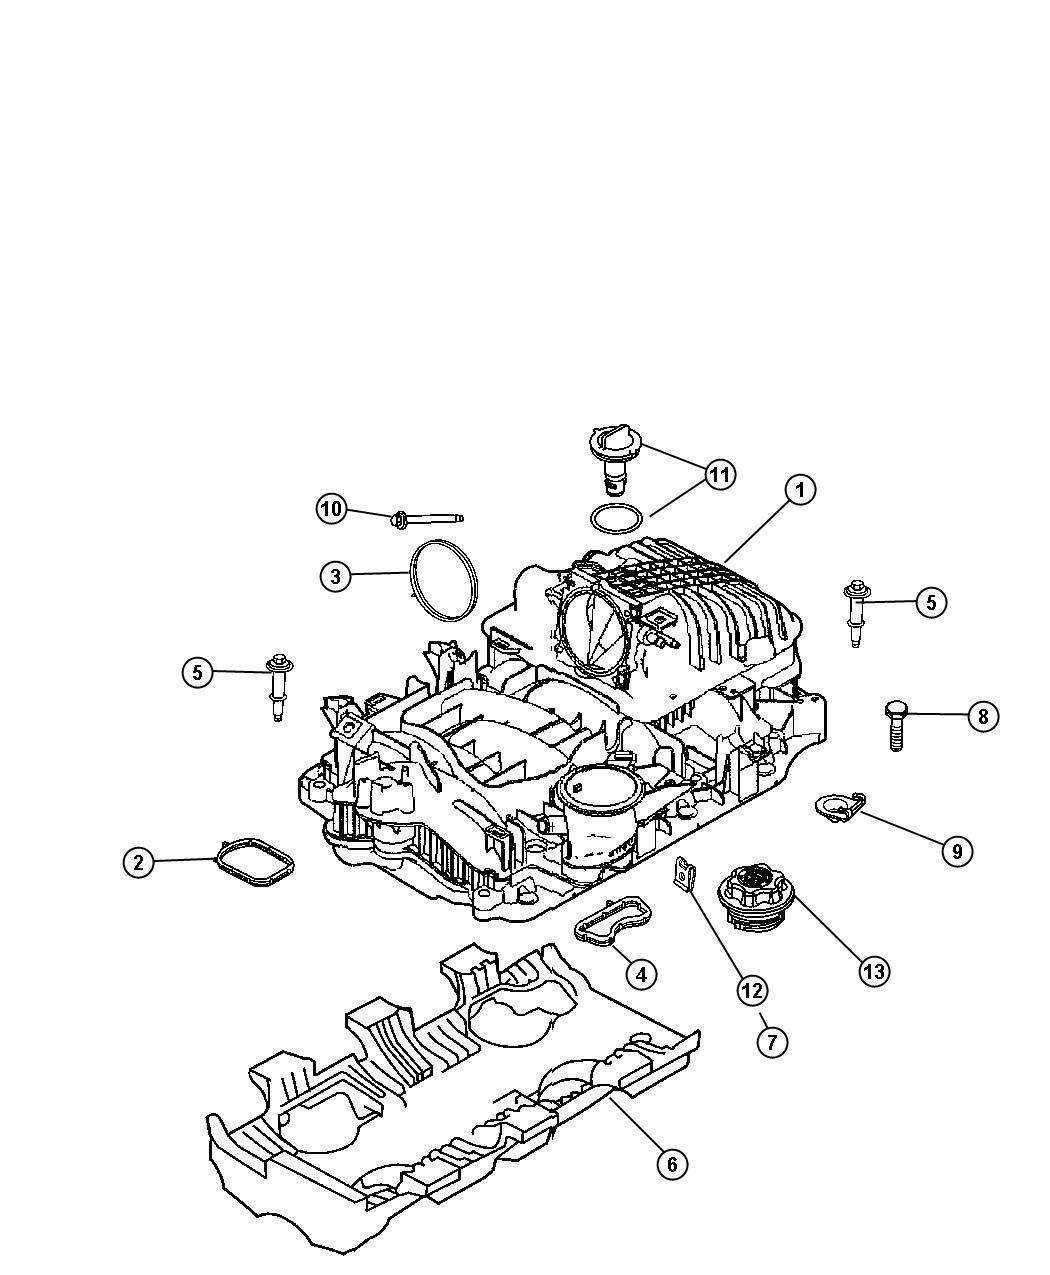 Chrysler Aspen Manifold Package Intake Cab Manifolds